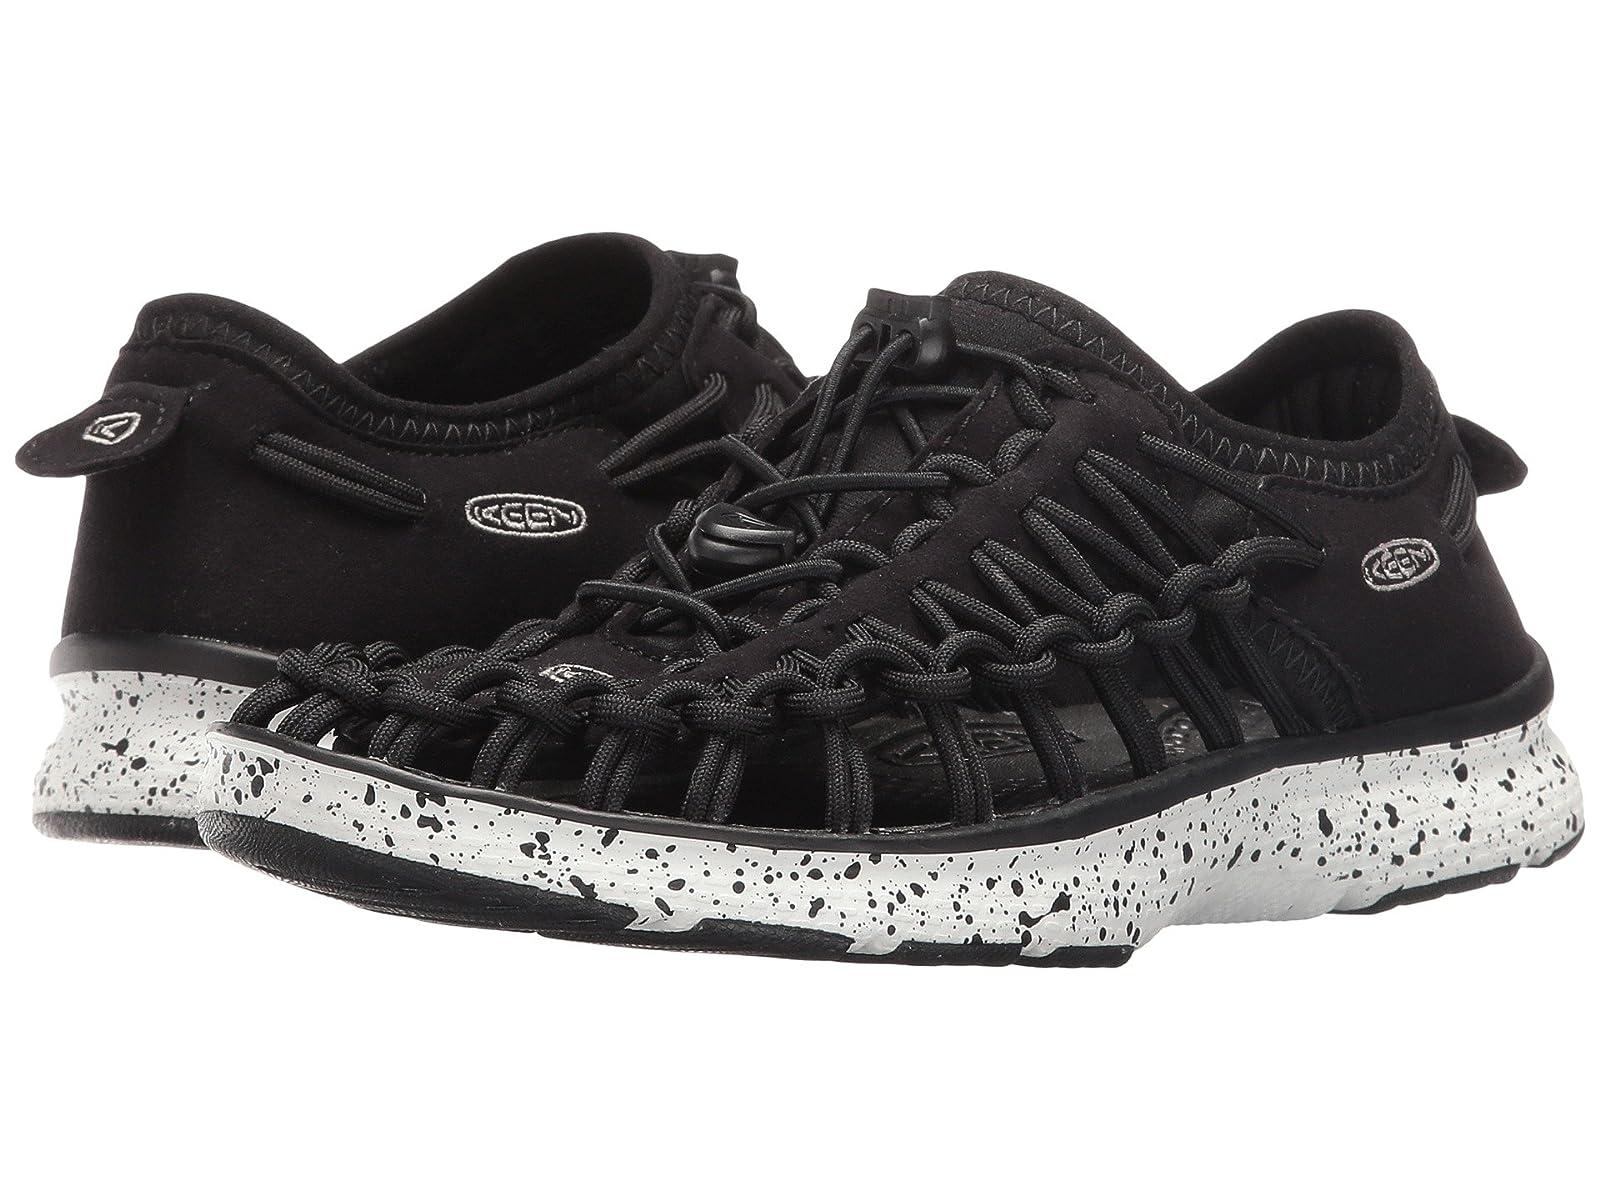 Keen Kids Uneek O2 (Little Kid/Big Kid)Atmospheric grades have affordable shoes